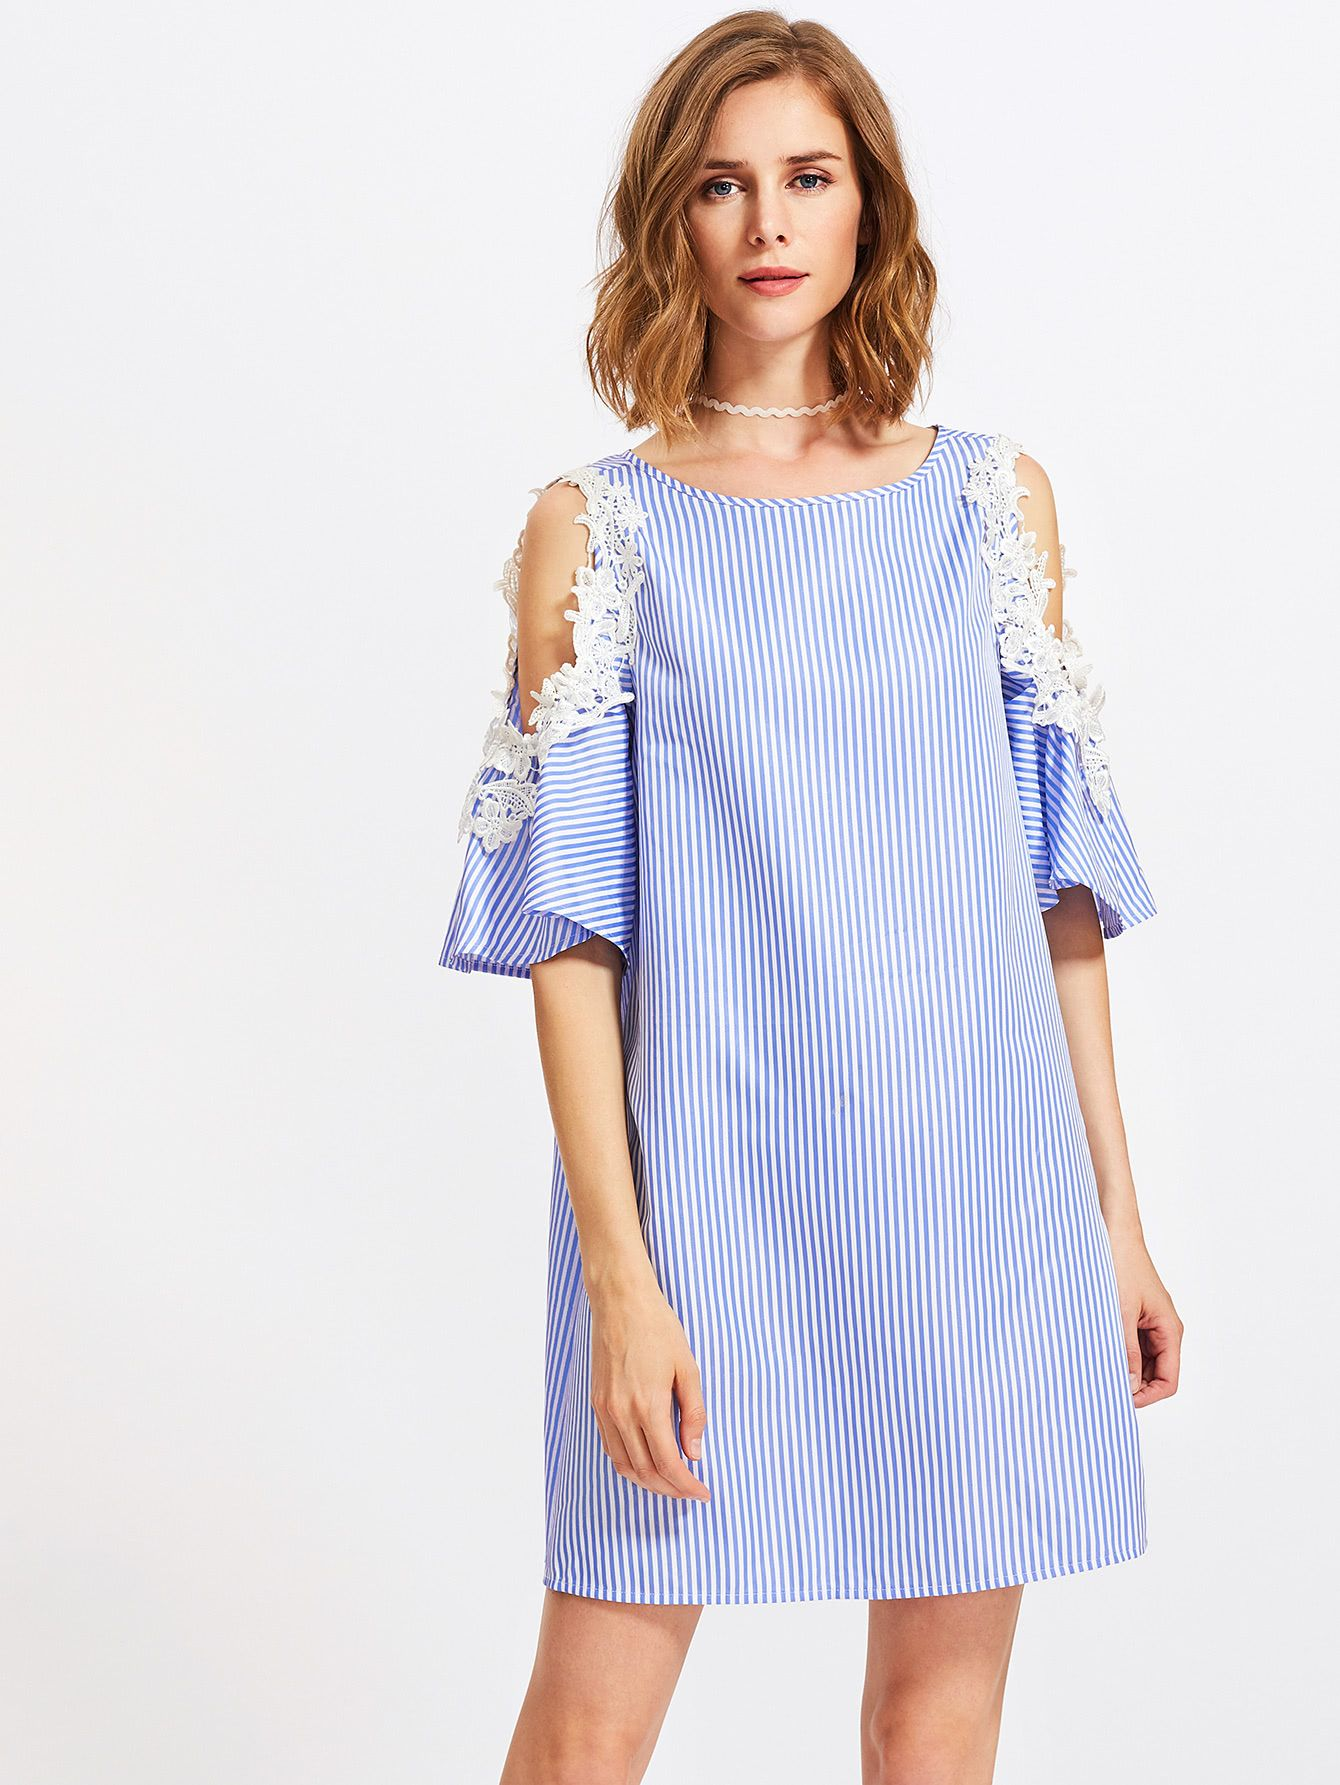 Blanca Padilla   Sweater dress fashion, Dresses, Fashion